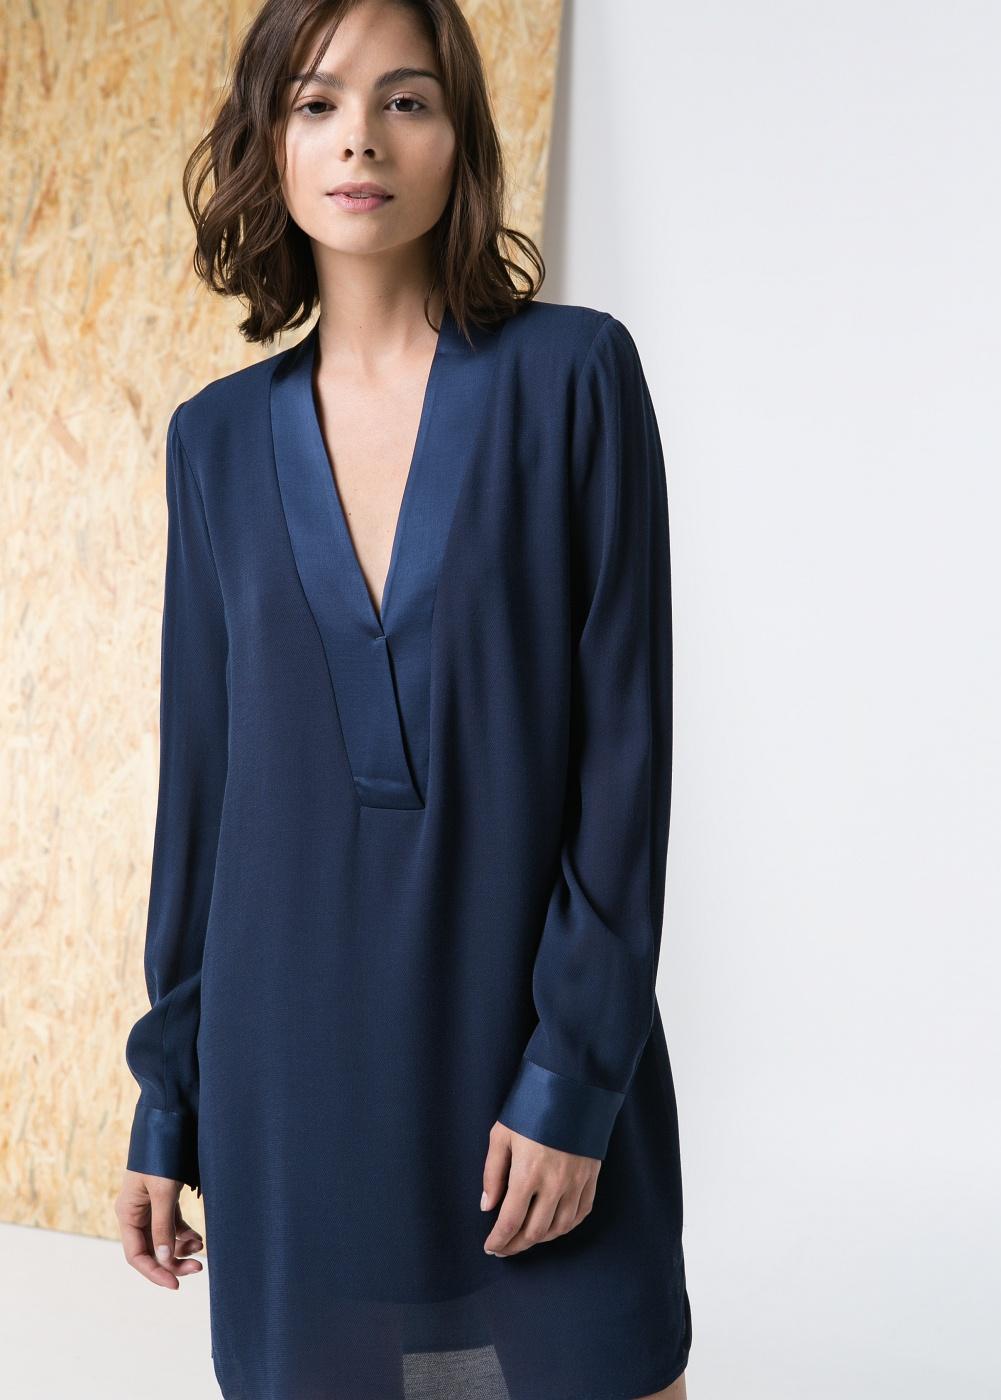 Vestido-túnica azul marino